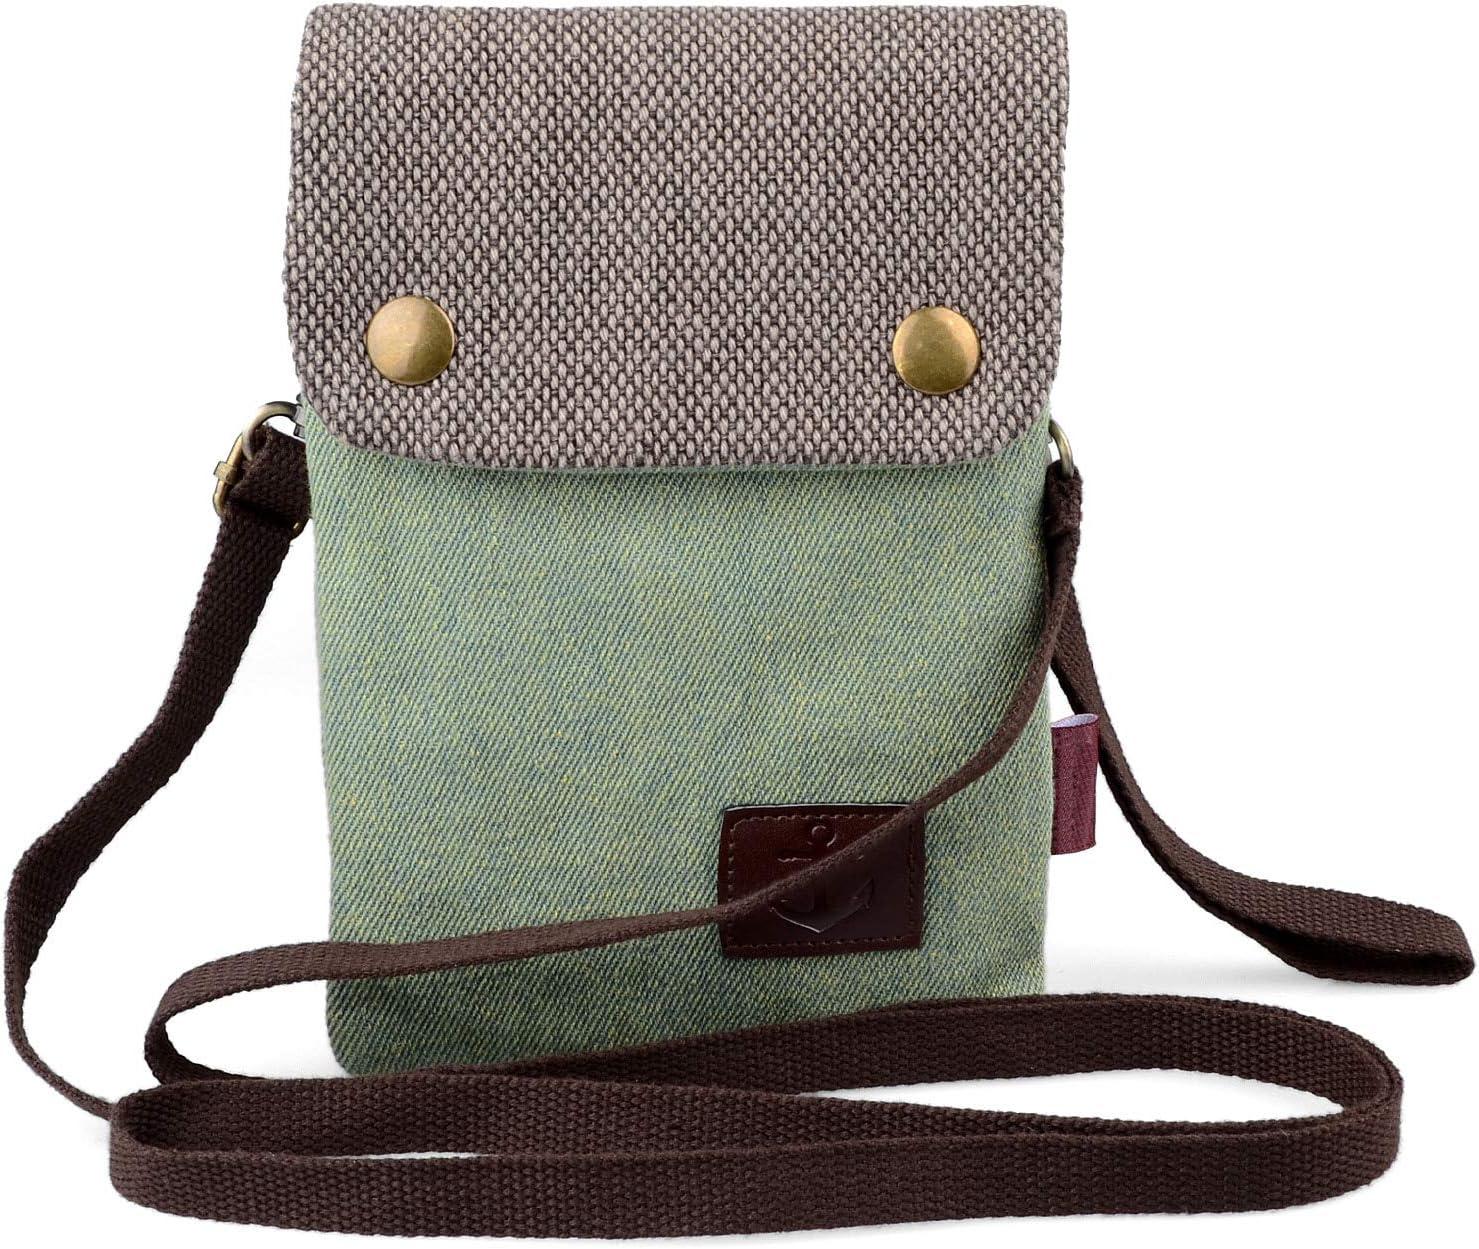 "Katloo Women Mini Cute Crossbody Bag Wristlet Cellphone Wallet Purse Loose Change Pouch for 5.5"" Smartphone Cards Clutch Handbag with Shoulder Strap Nail Clipper"